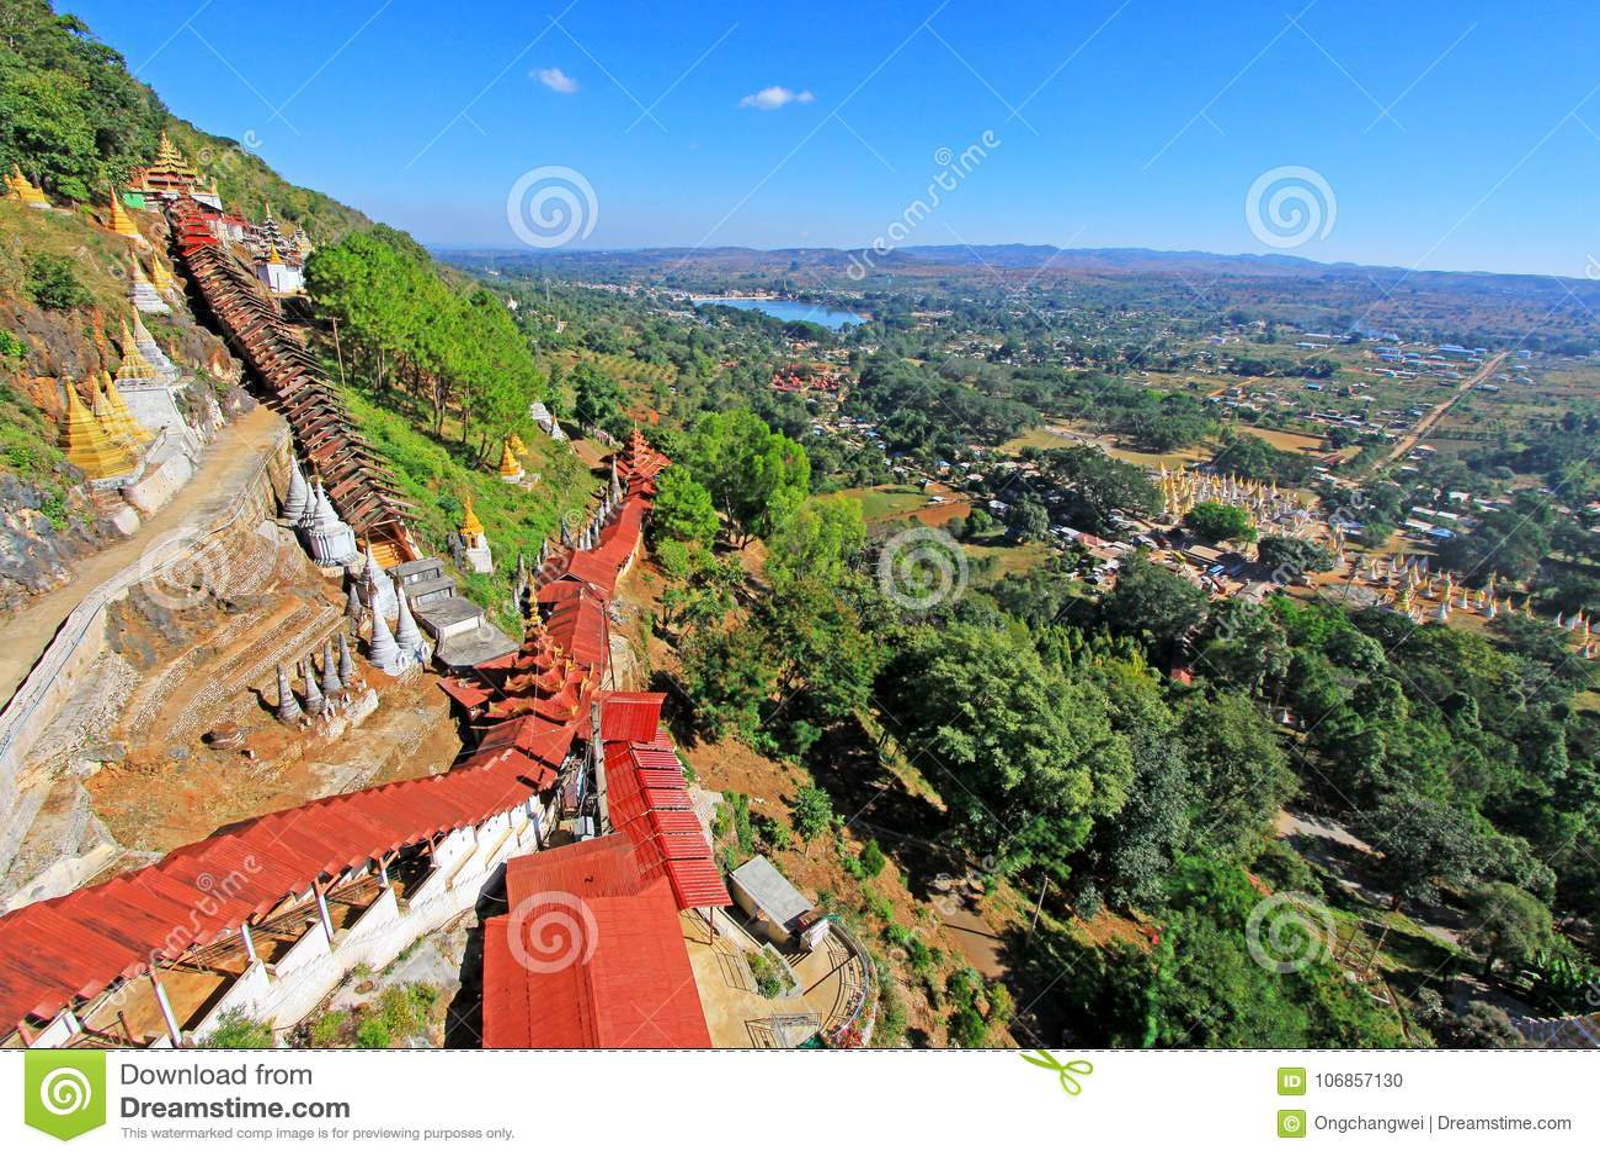 Cavernes de Pindaya, Pindaya, Myanmar